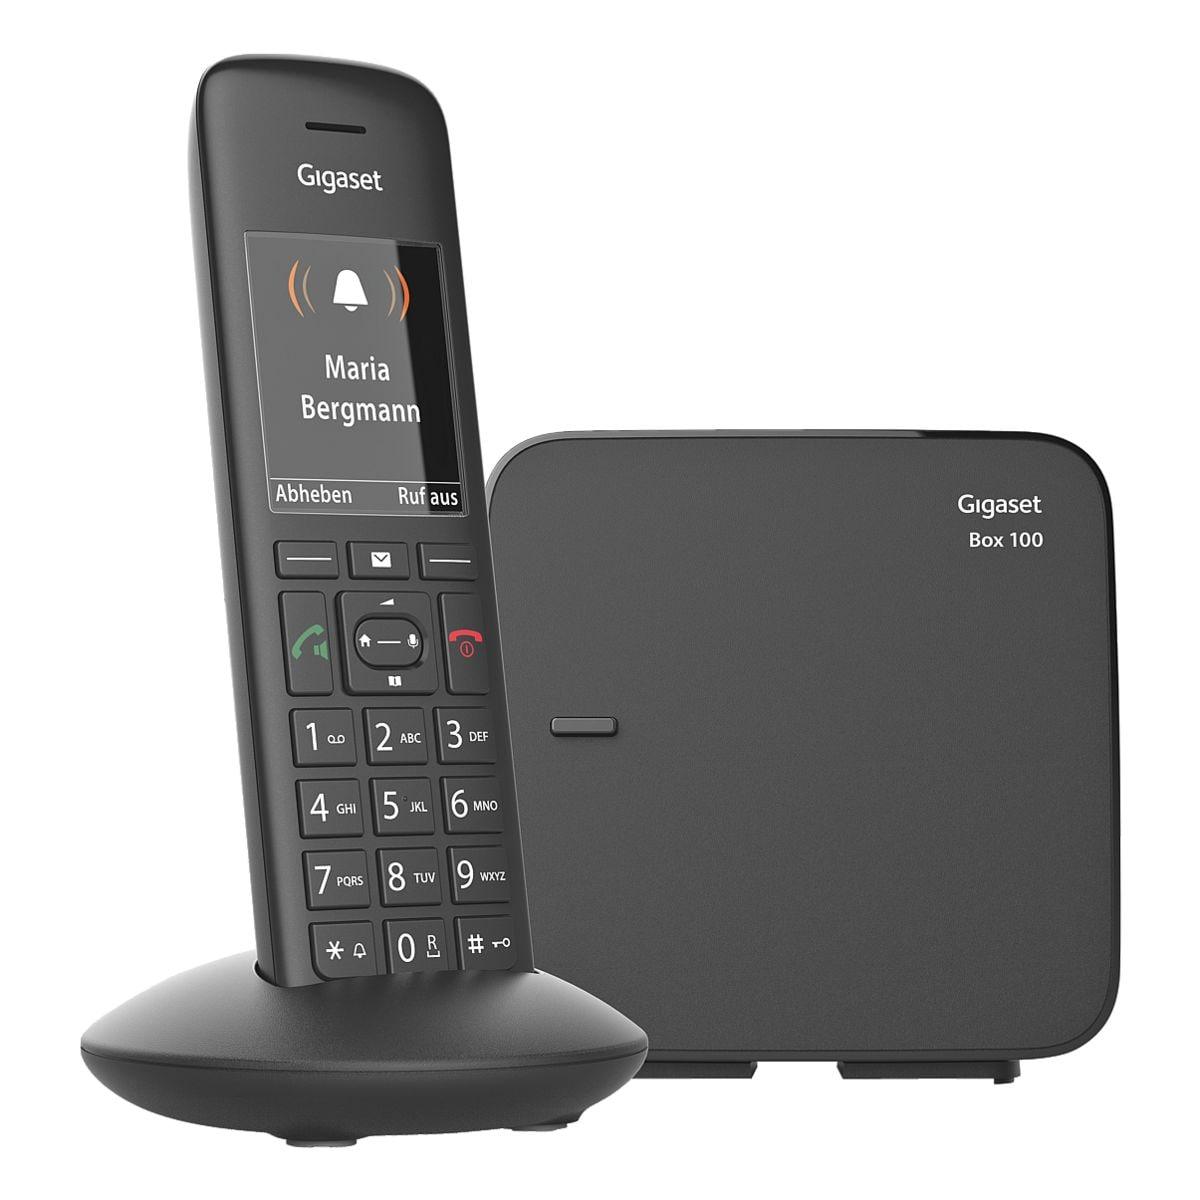 gigaset schnurloses telefon c570 bei otto office. Black Bedroom Furniture Sets. Home Design Ideas